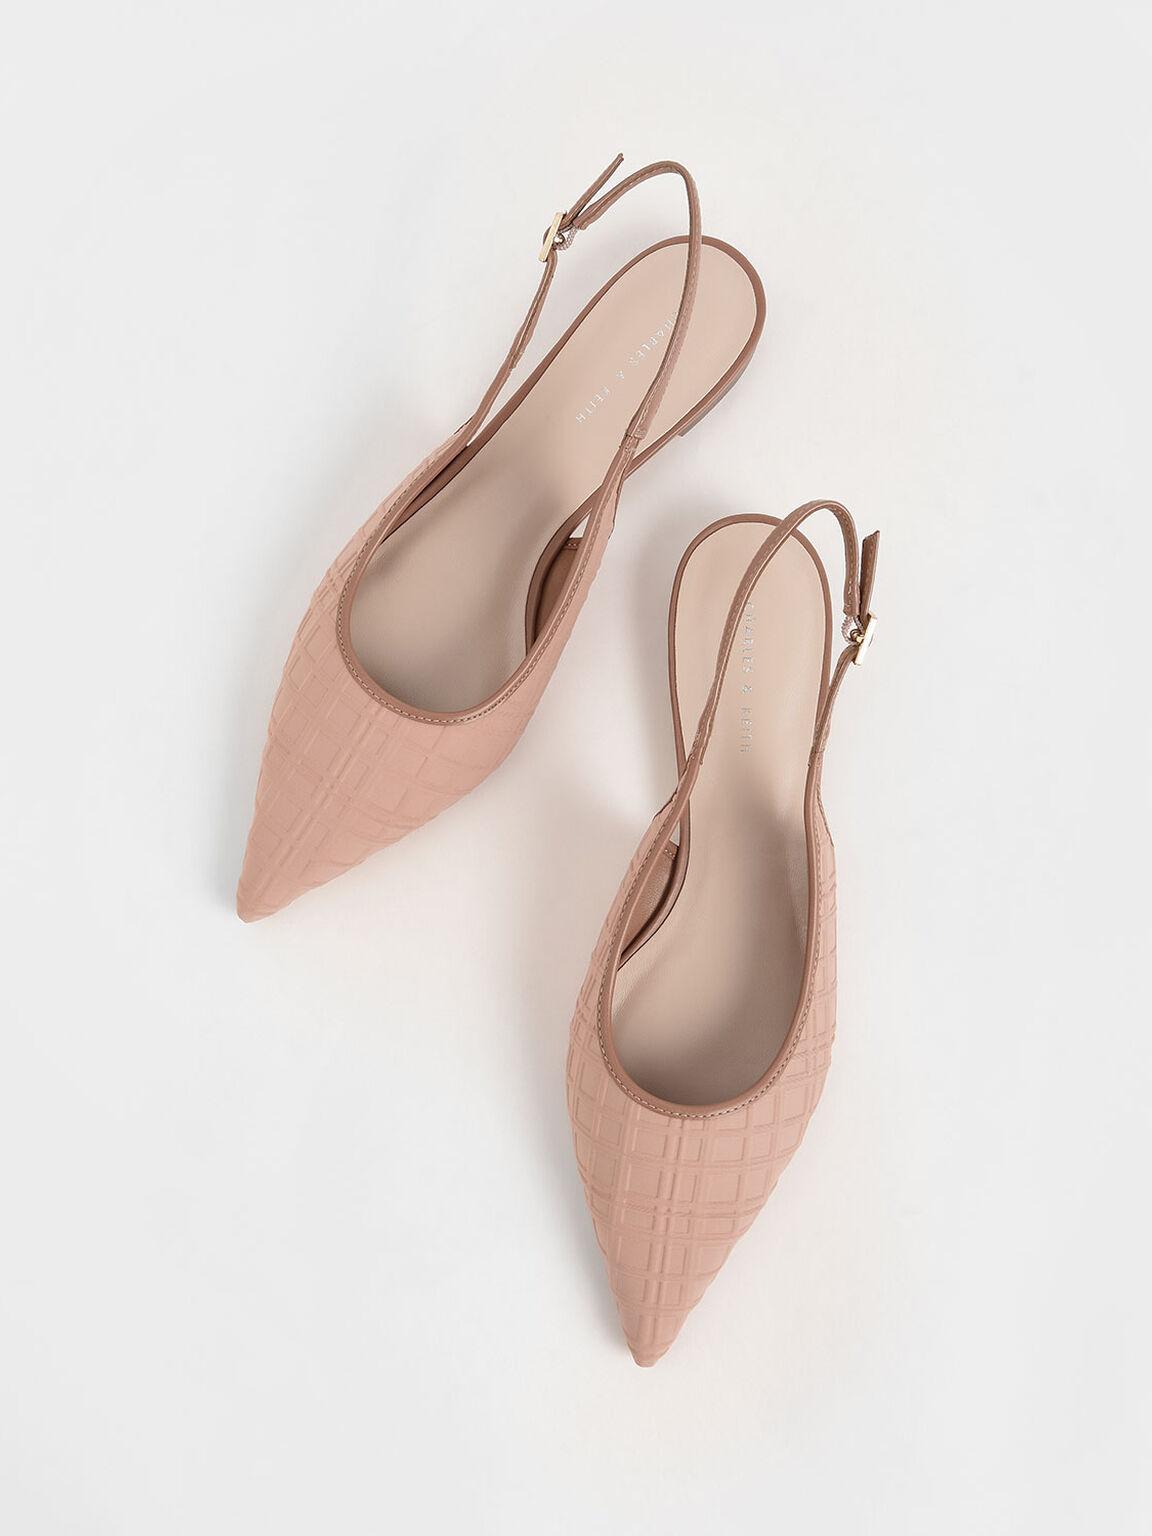 Printed Slingback Ballerina Flats, Nude, hi-res